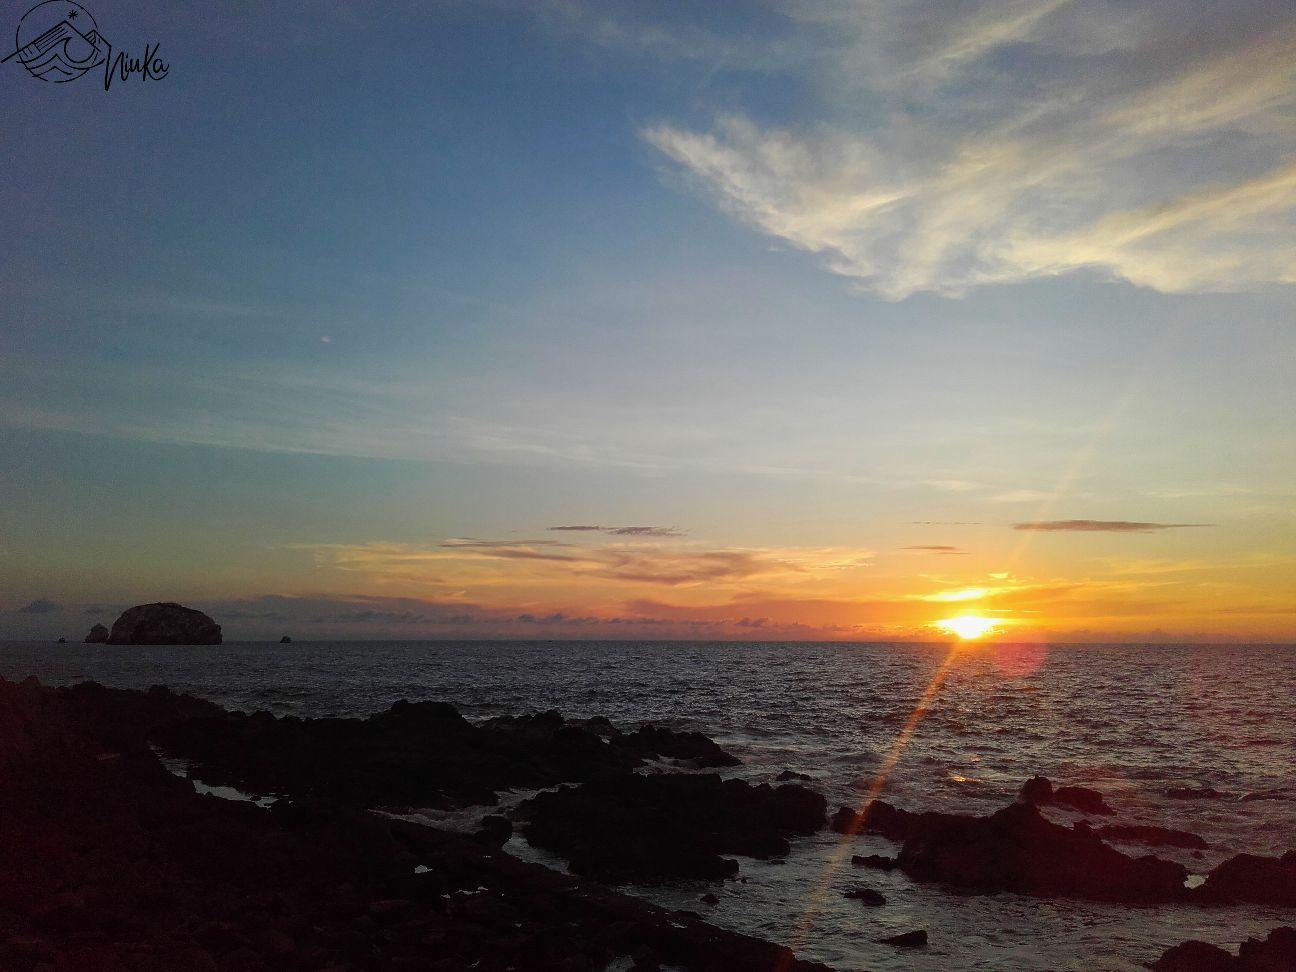 Sonnenunntergang in Mazatlán